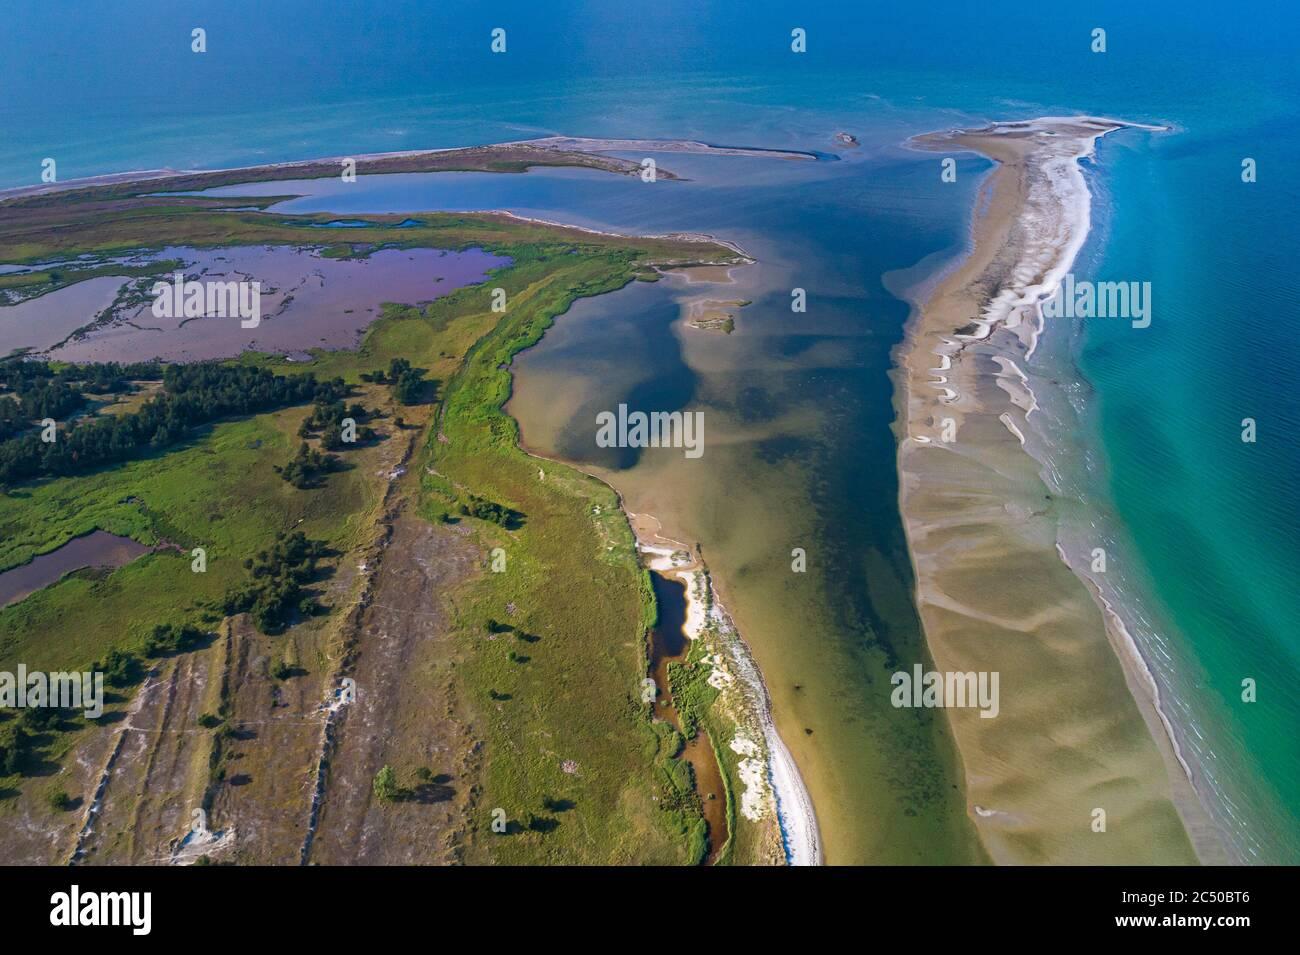 Baltic sea, Germany, Mecklenburg-Western Pomerania, Darß, Prerow, aeriel view of seaside Stock Photo